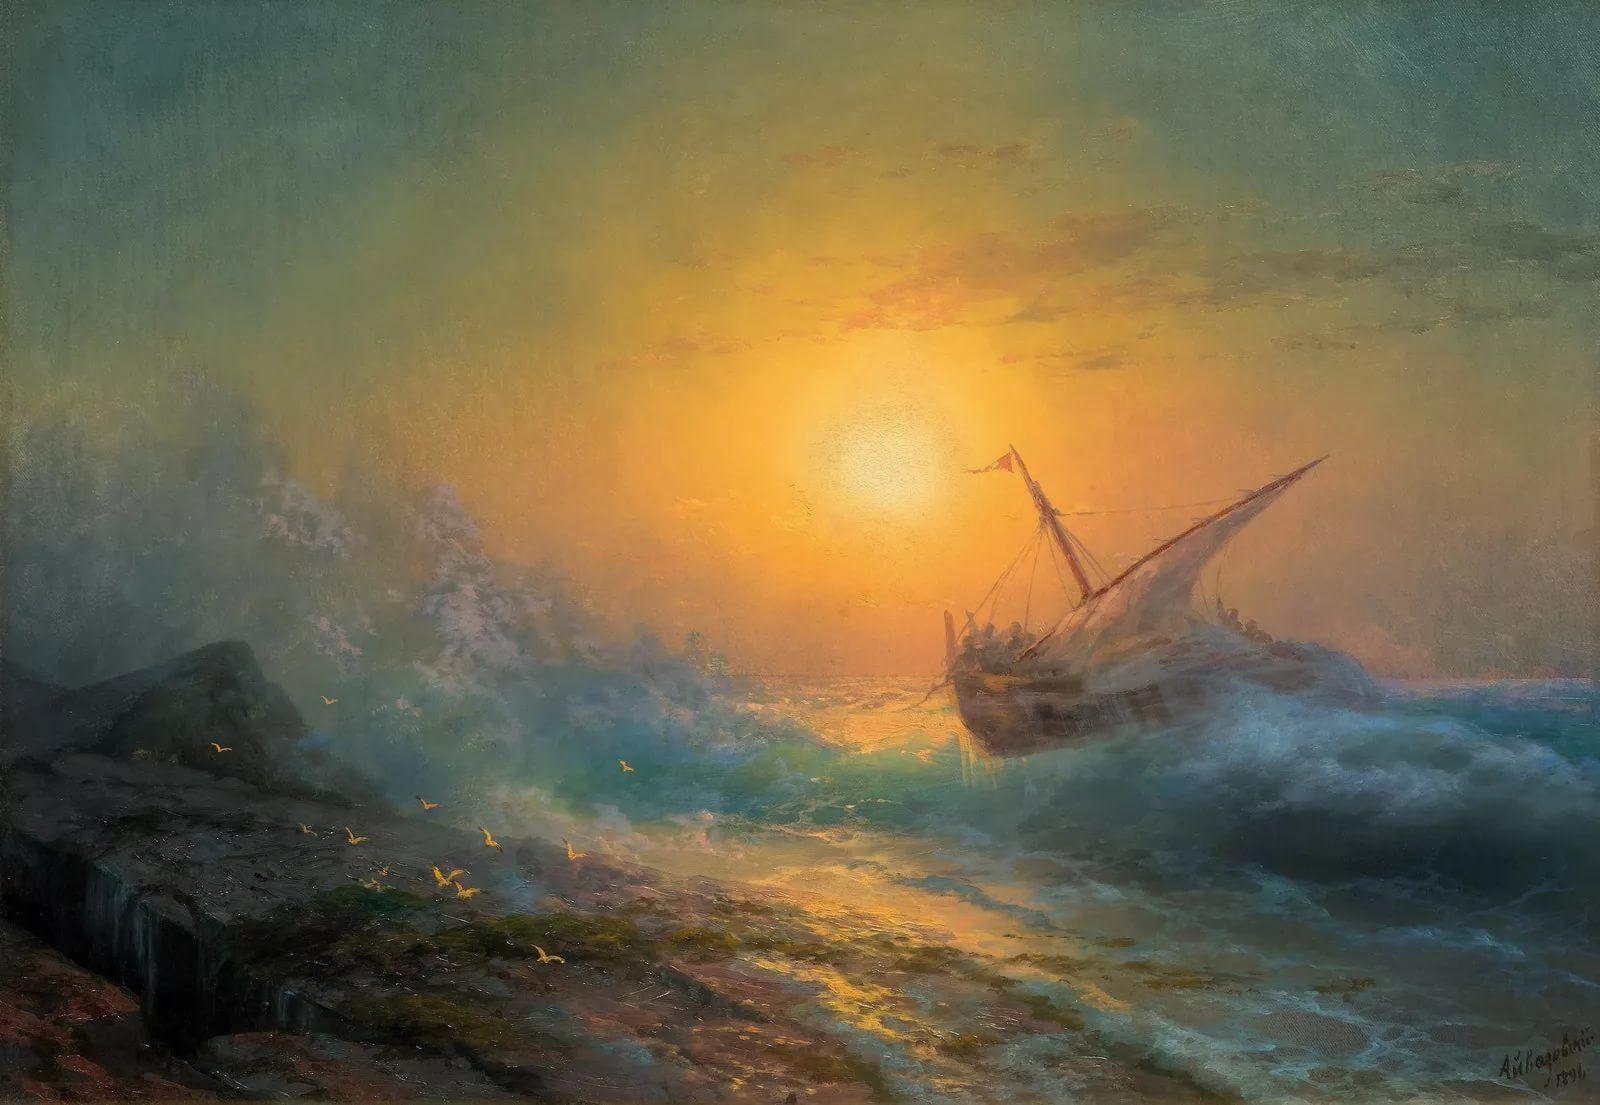 Картинка море айвазовского